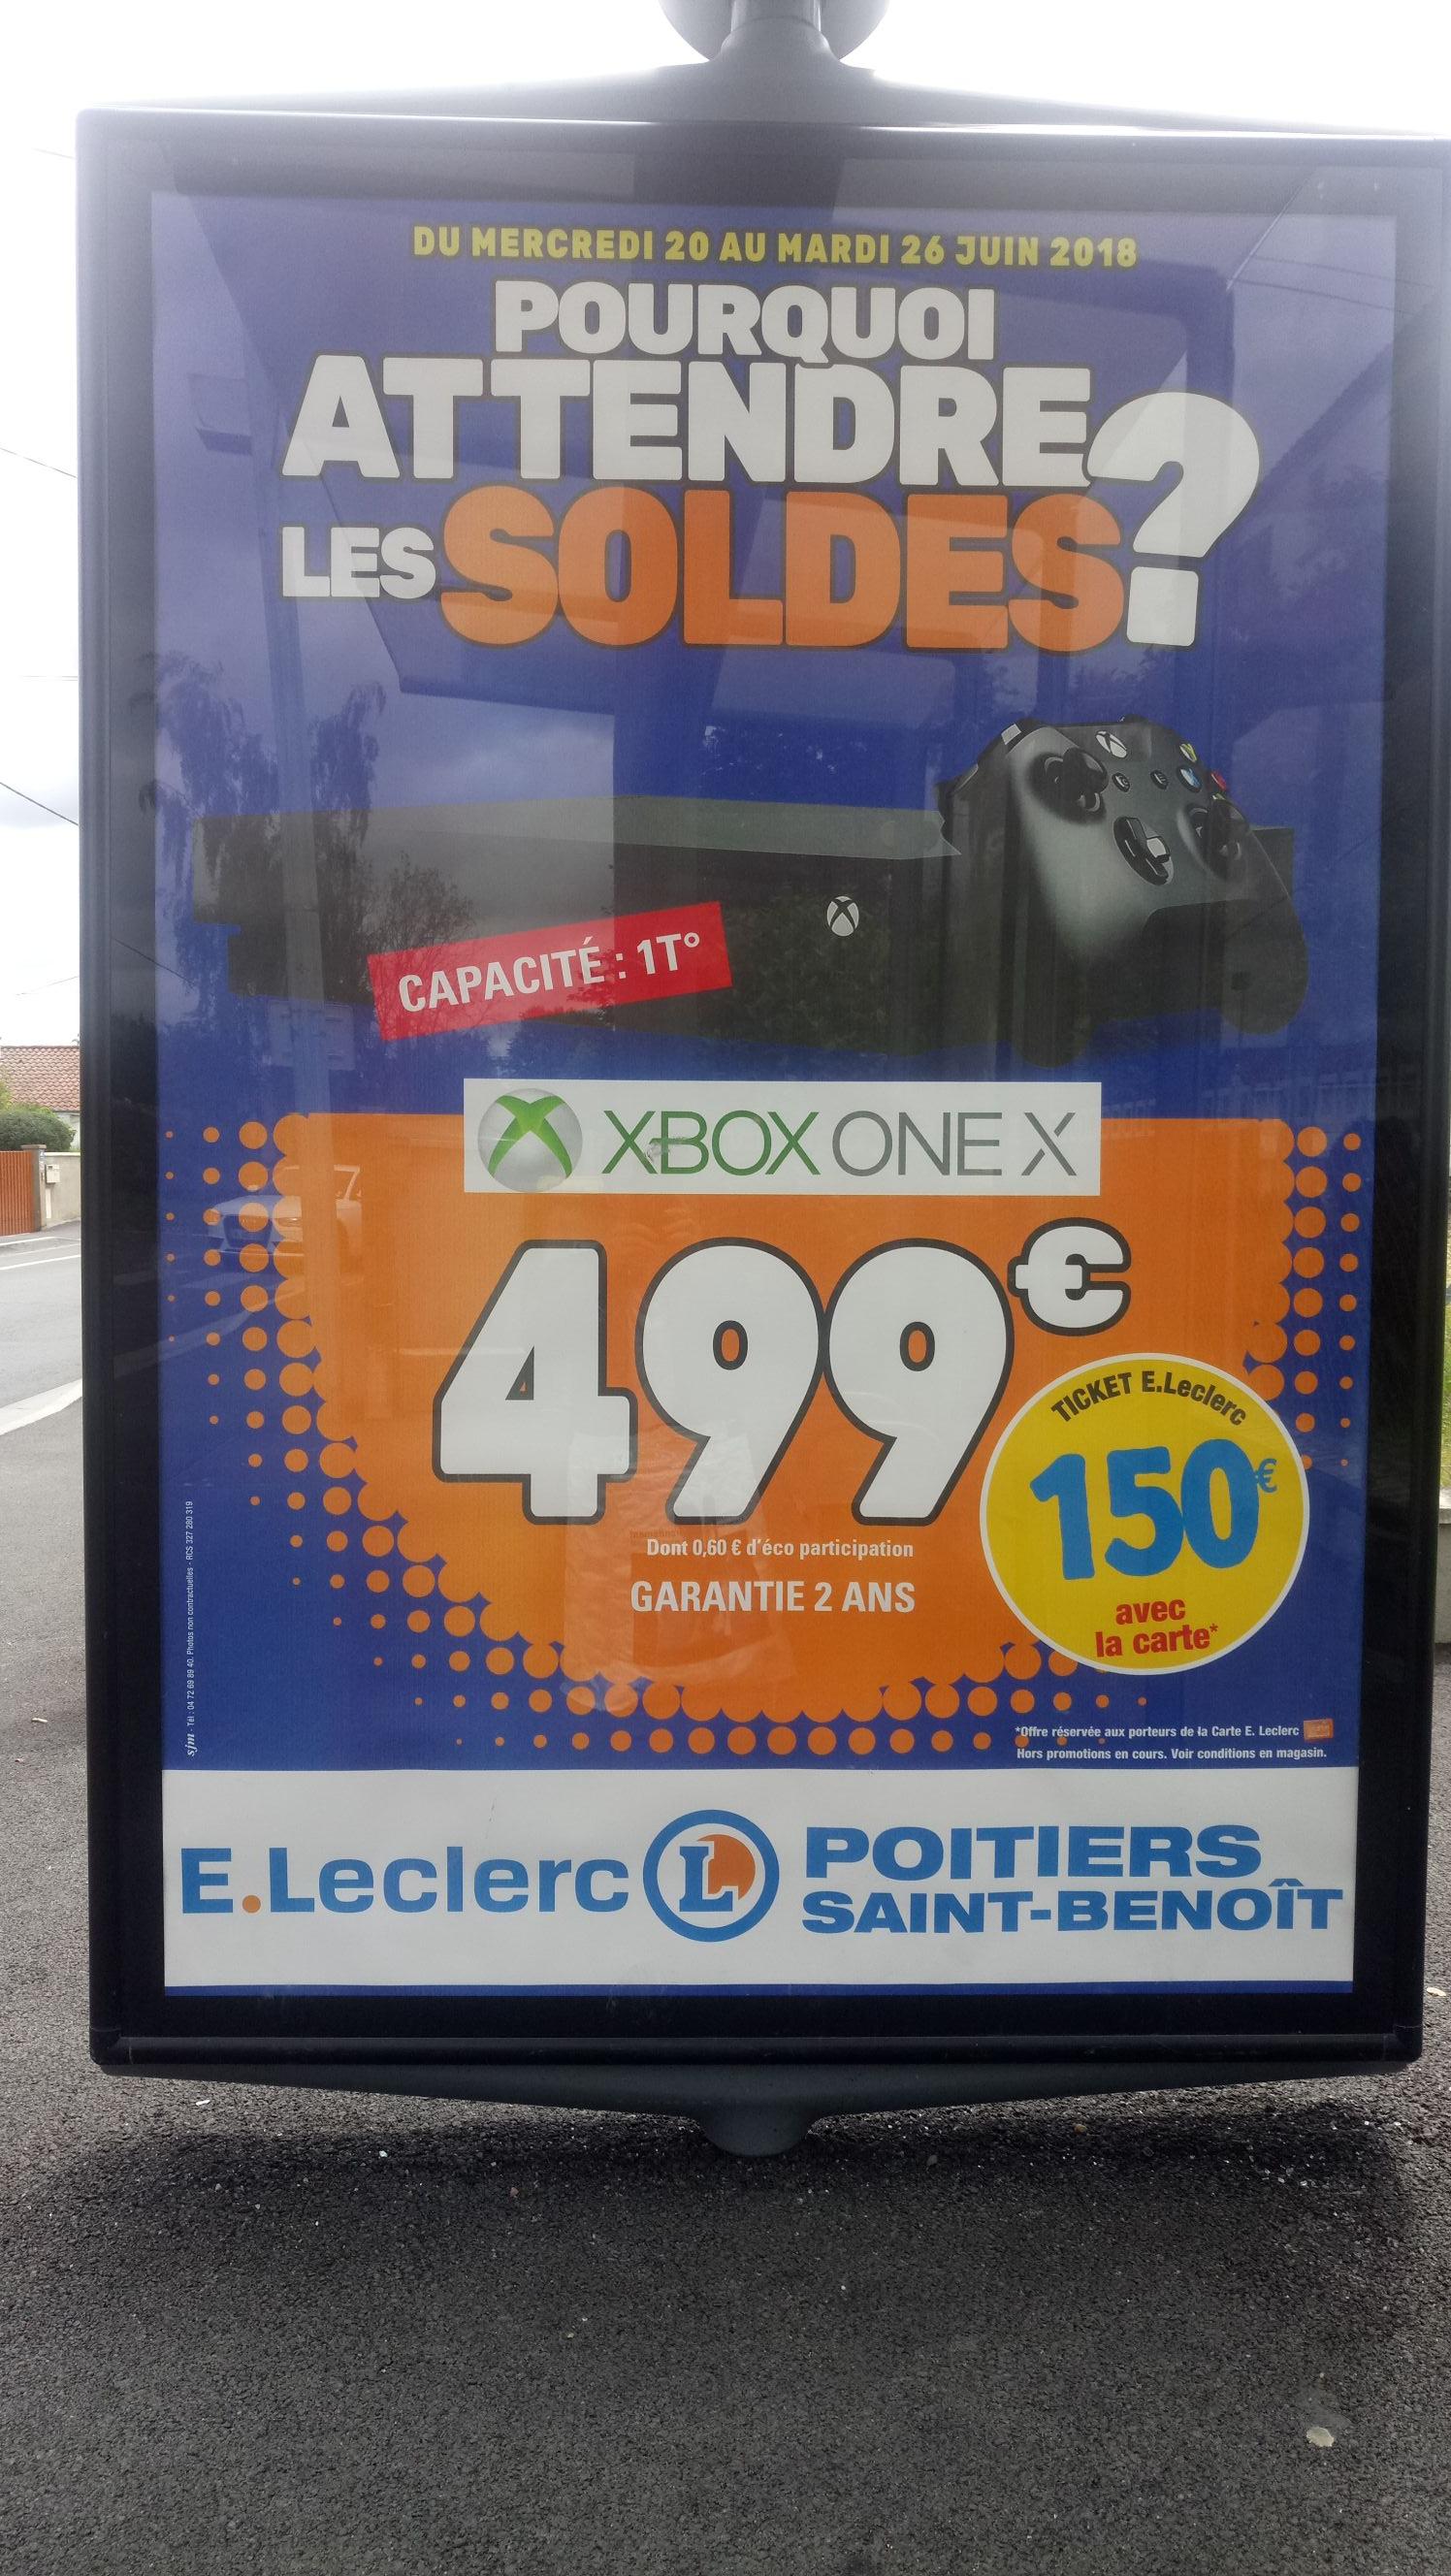 Console microsoft xbox one x 1 to via 150 en tickets e for Leclerc poitiers